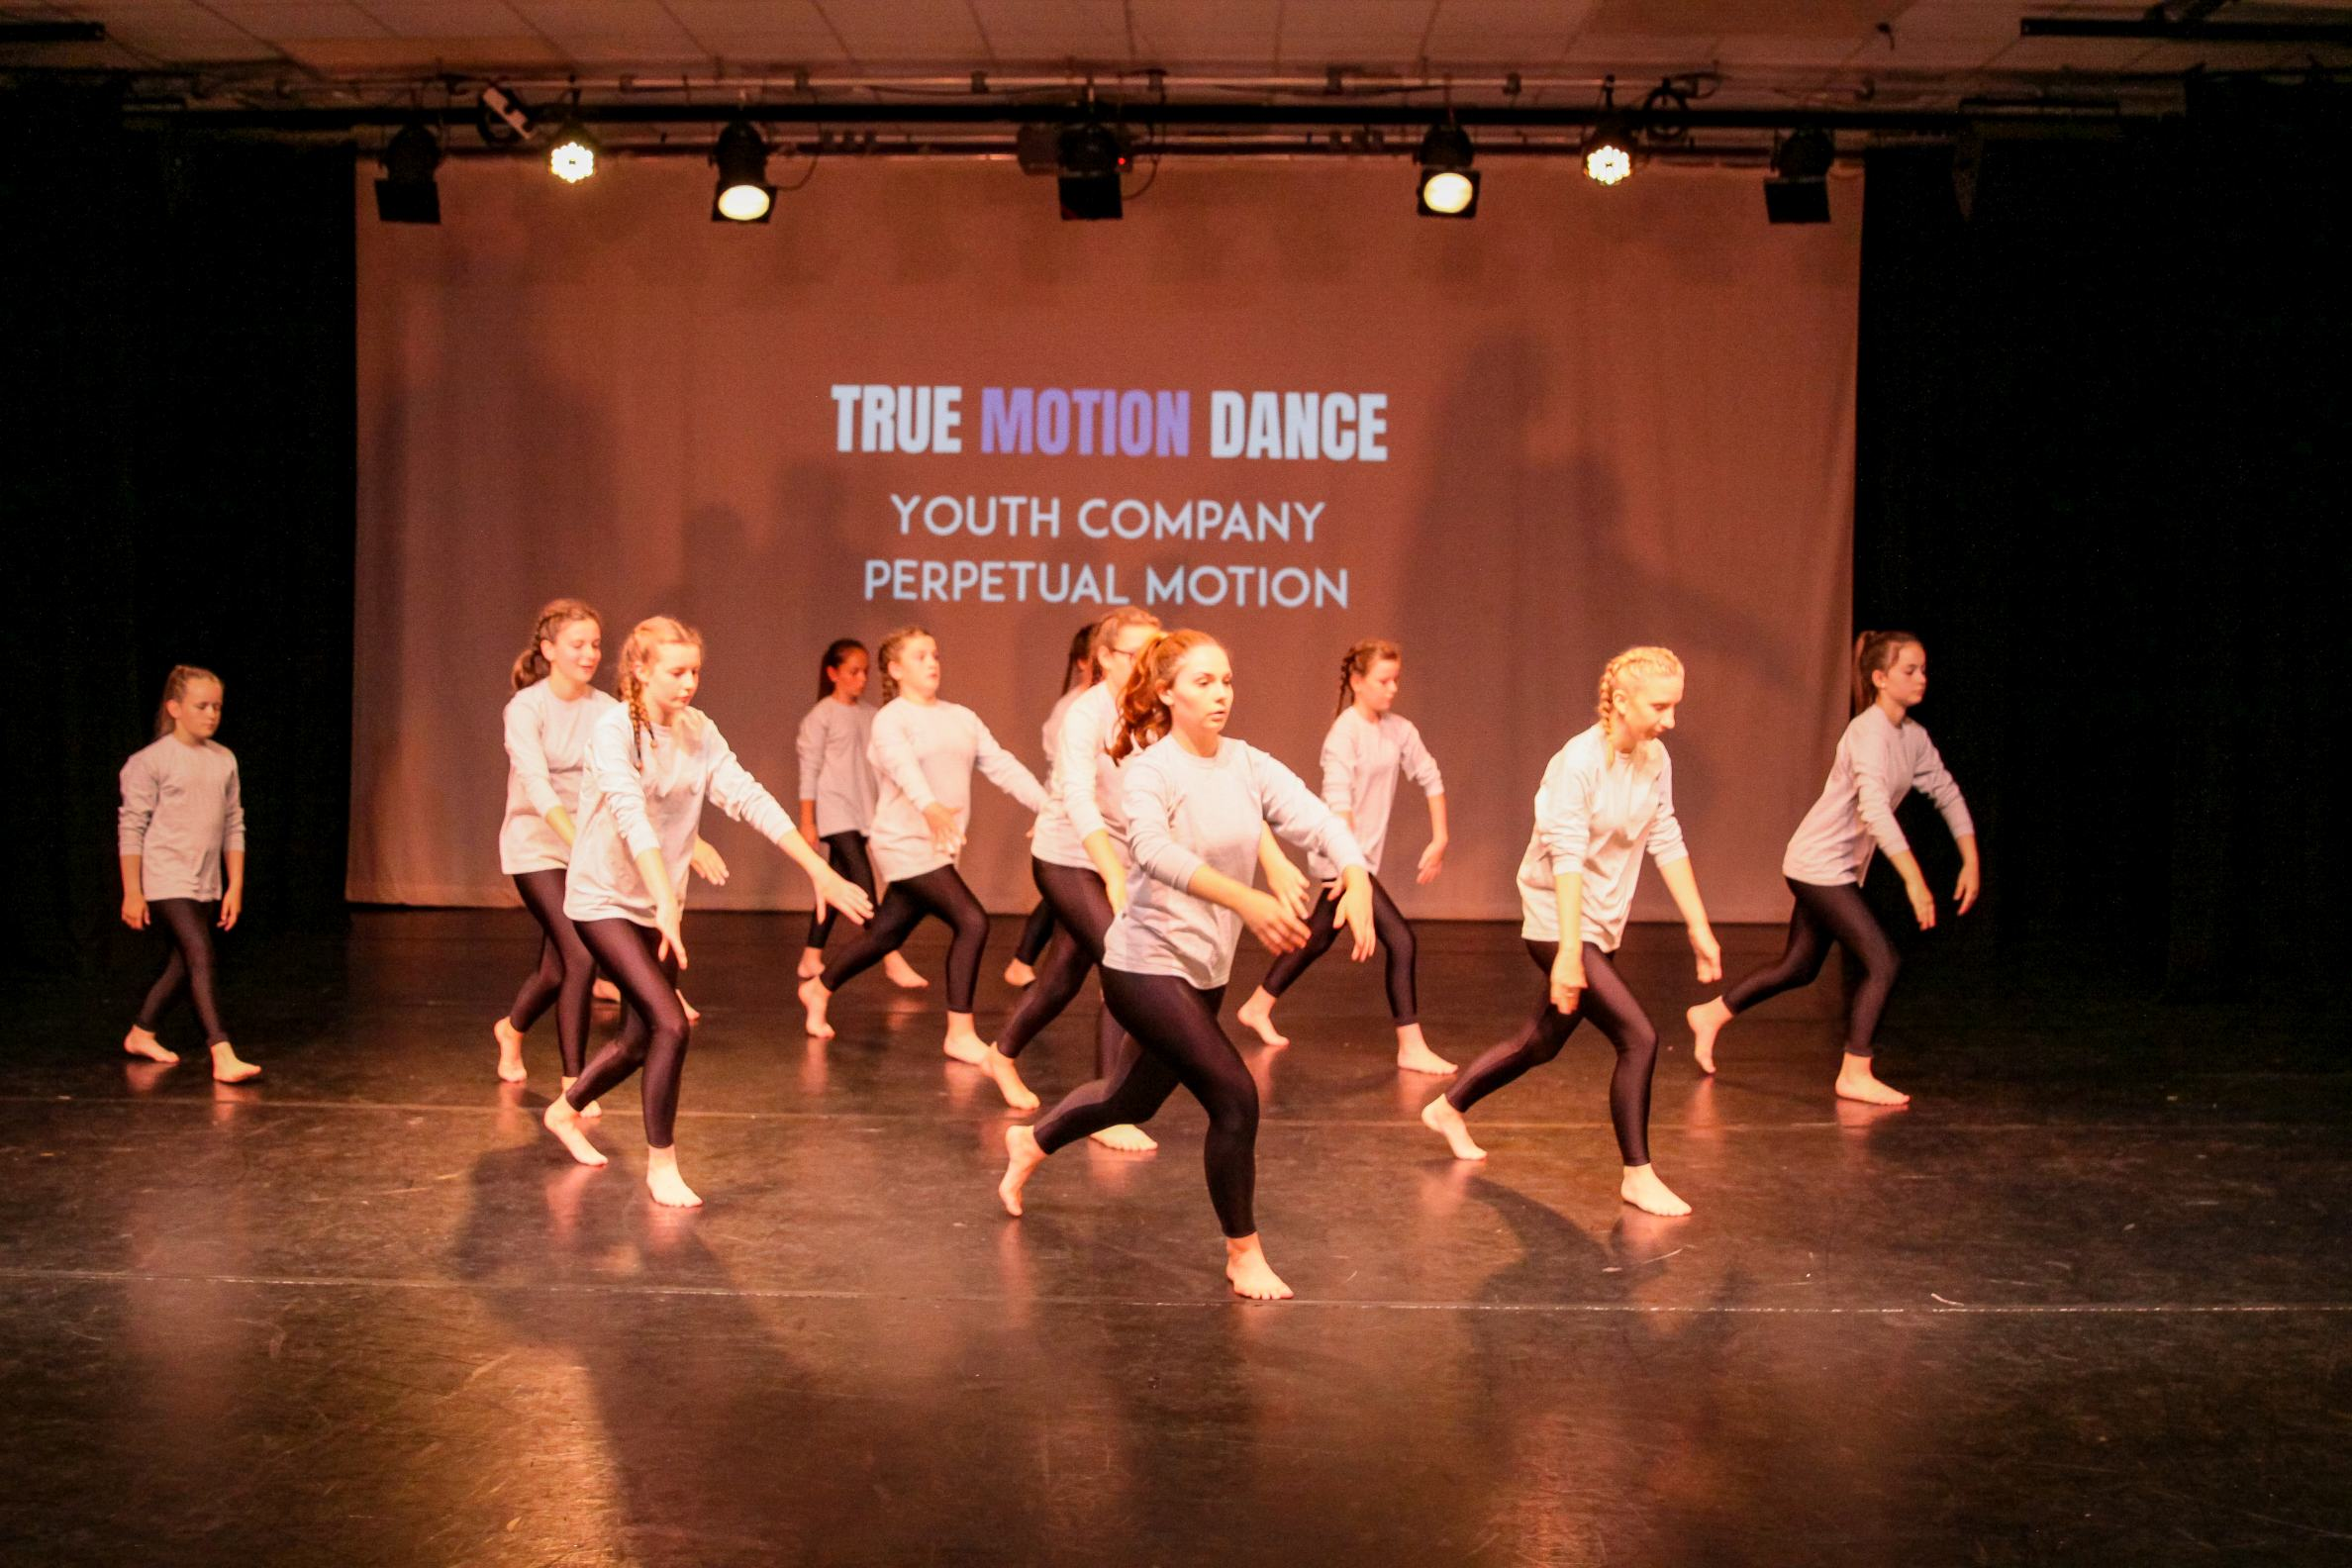 Elite youth dance company performance